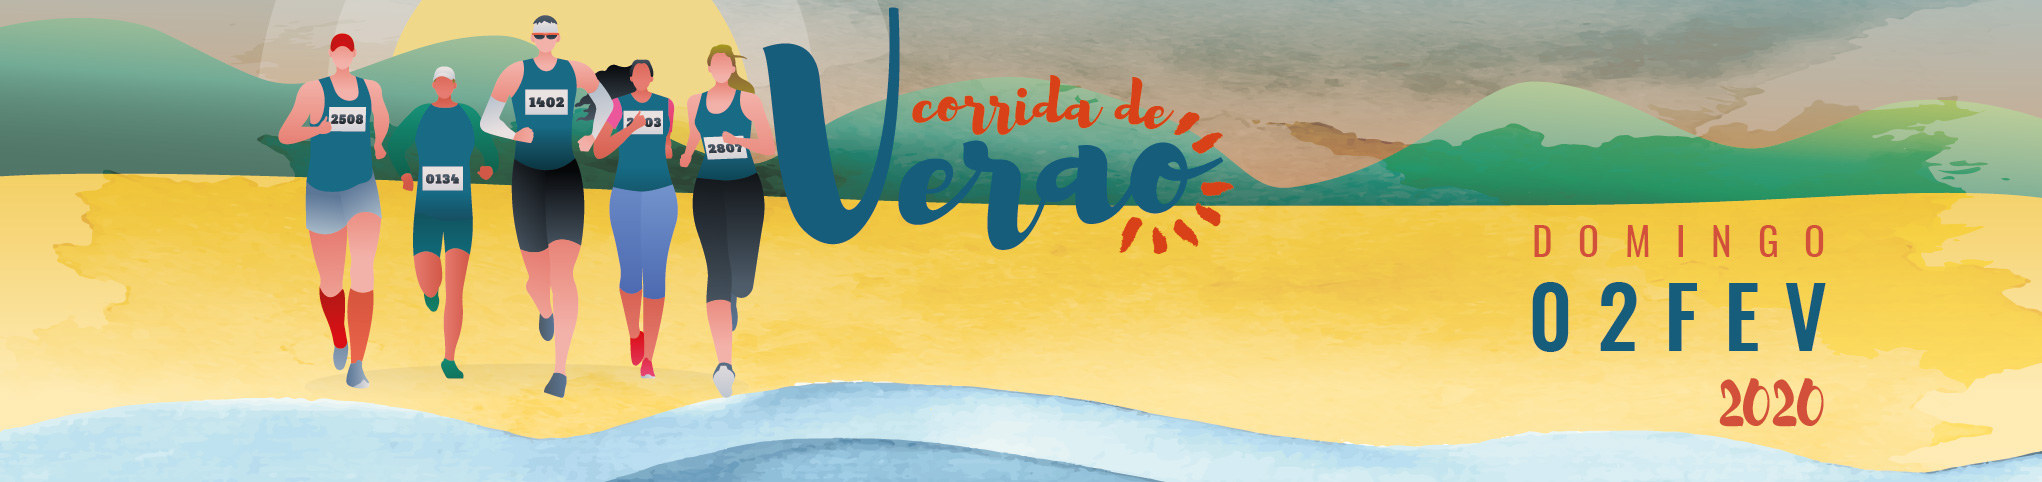 TBH_CORRIDA_VERÃO_980x231_Prancheta_1